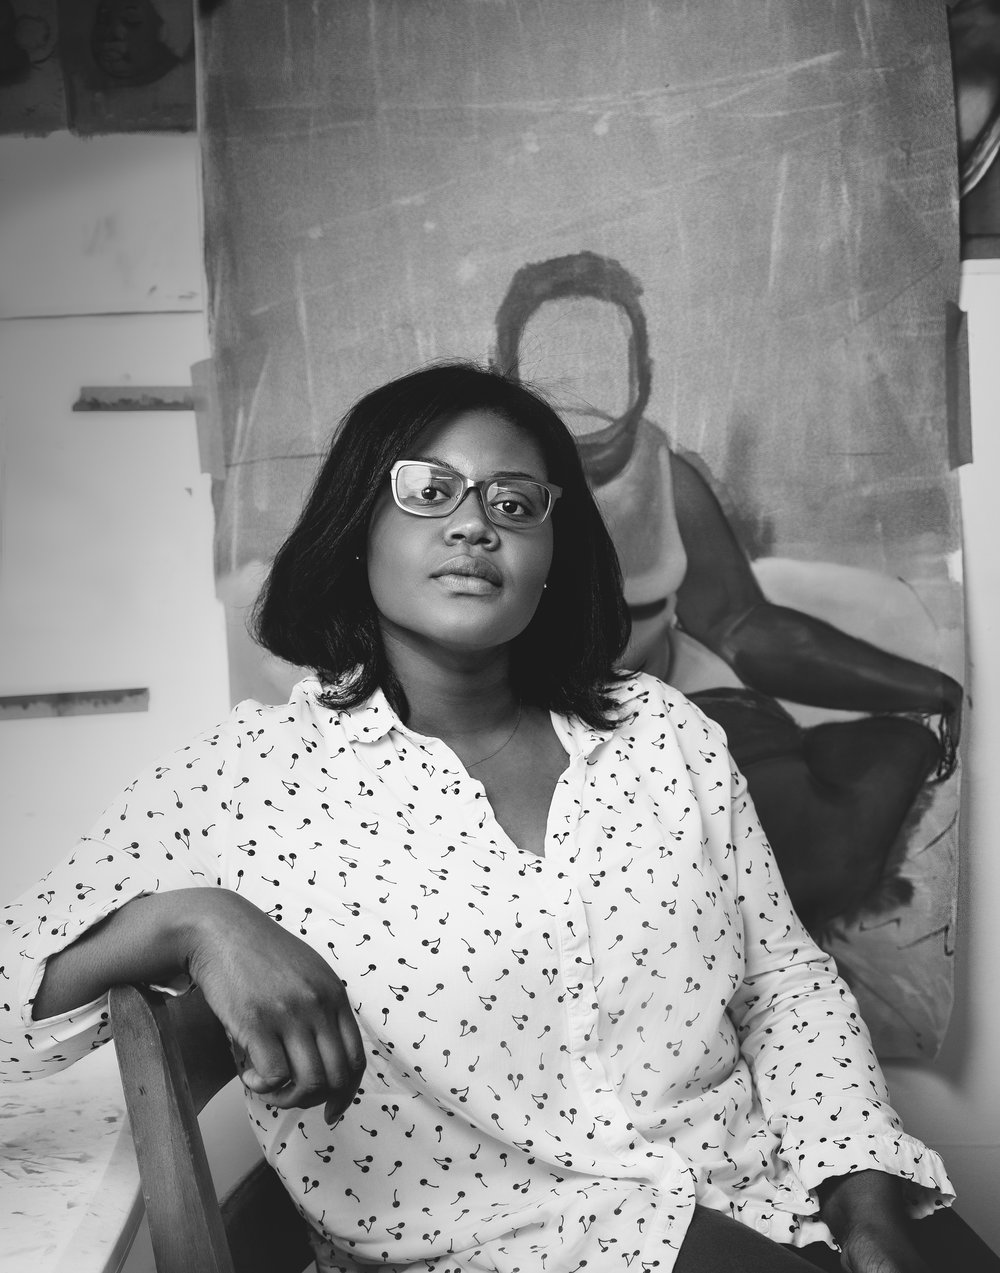 Shantel Miller, Artist Photograph by Ebti Nabag